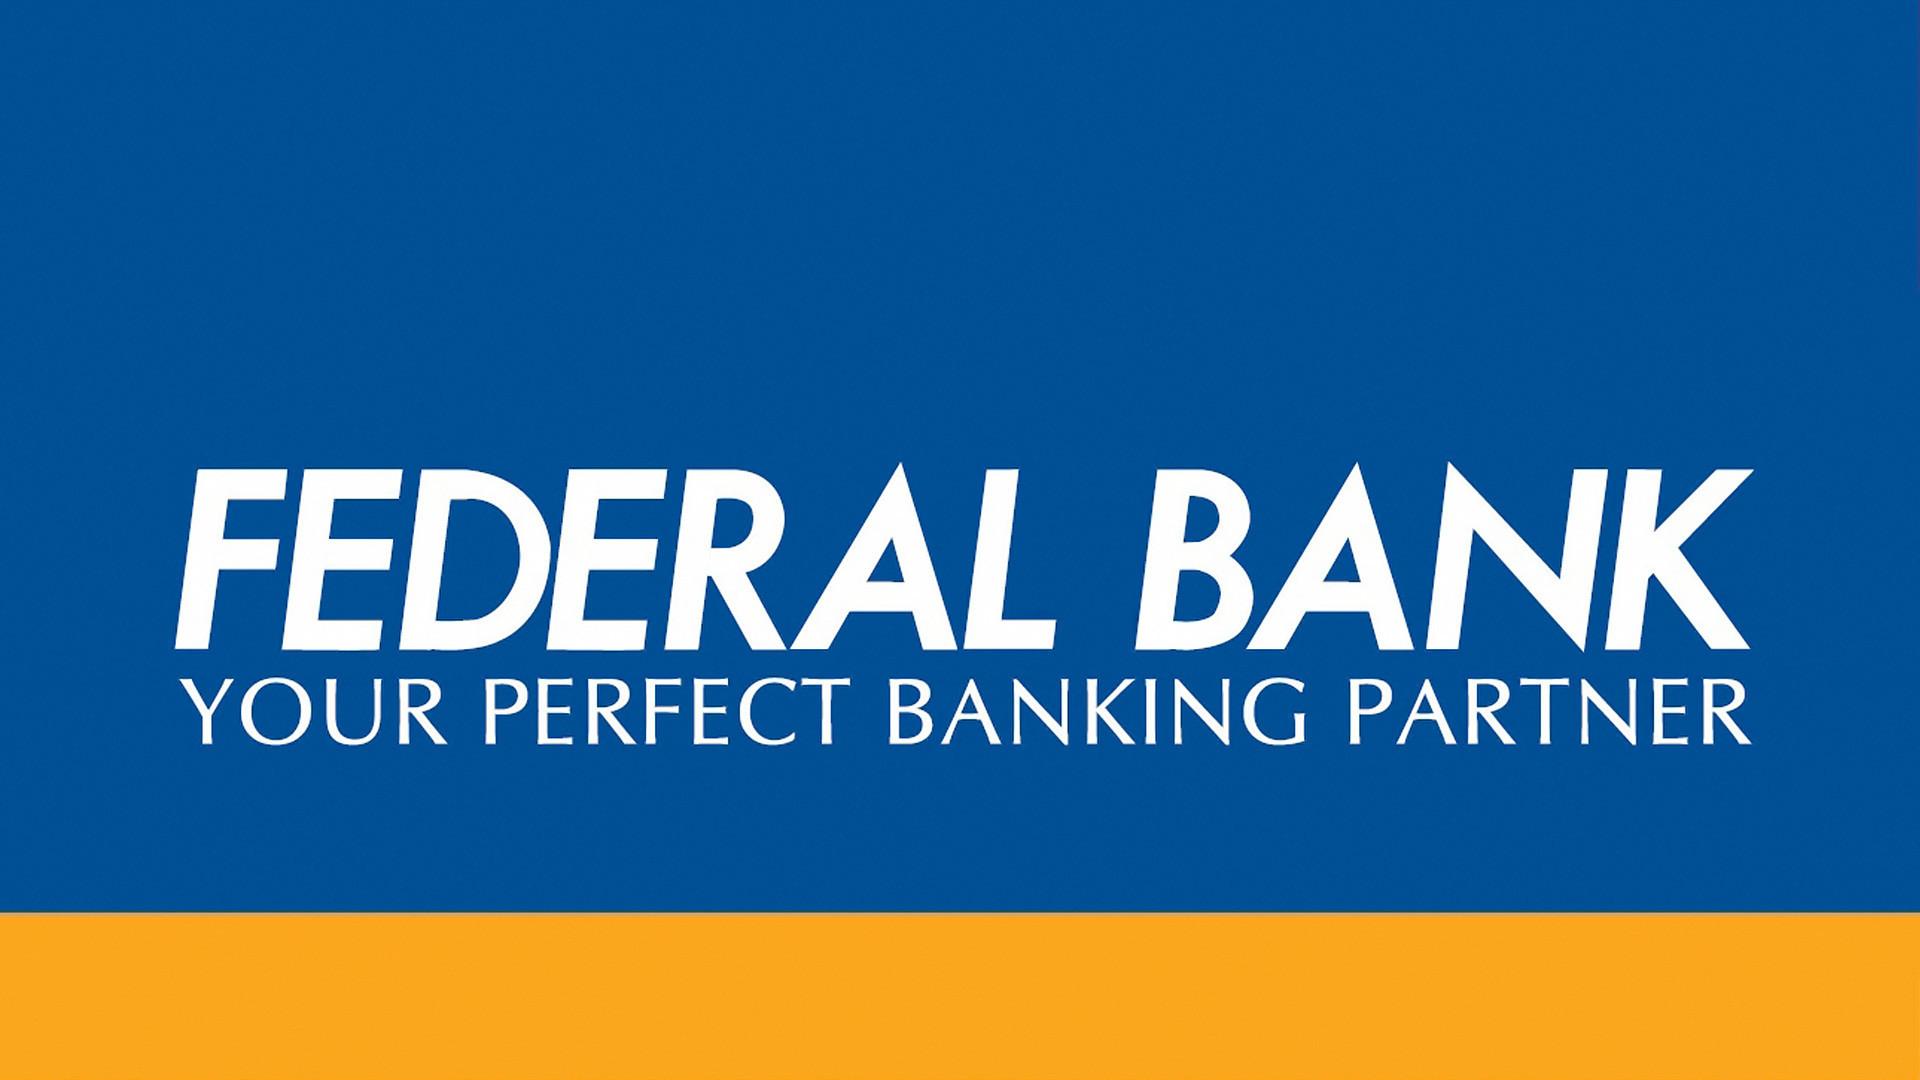 federal-bank-logo-HD.jpg